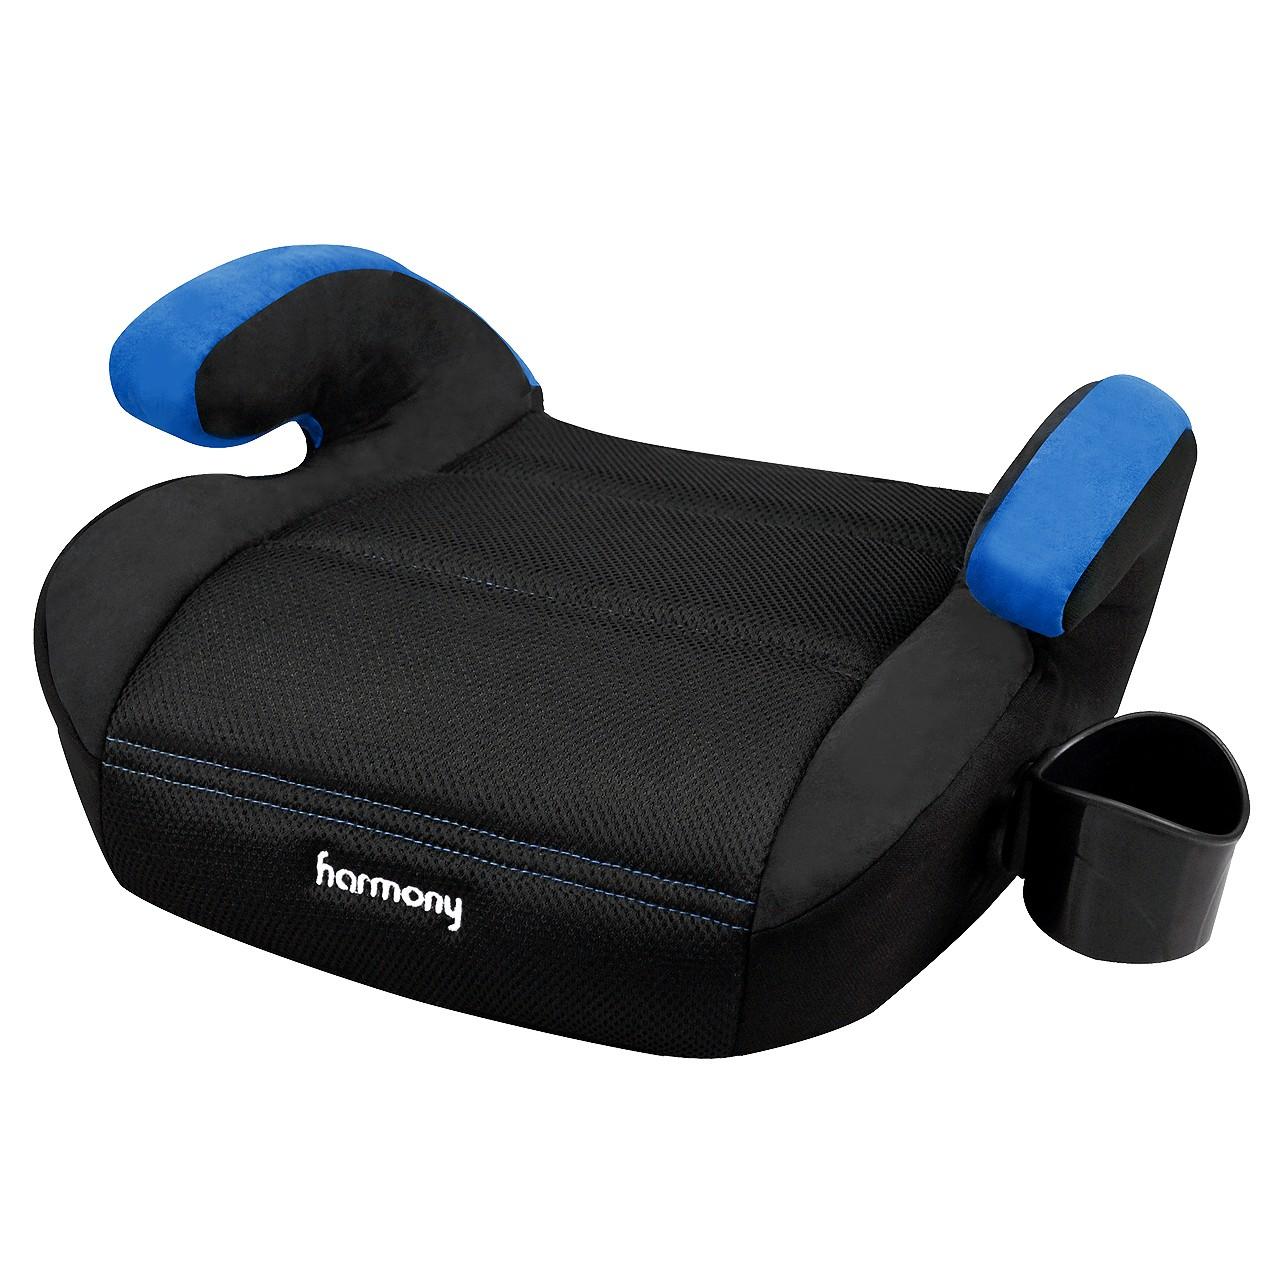 harmony high chair recall desk ergonomic dreamtime elite comfort booster car seat rich royal